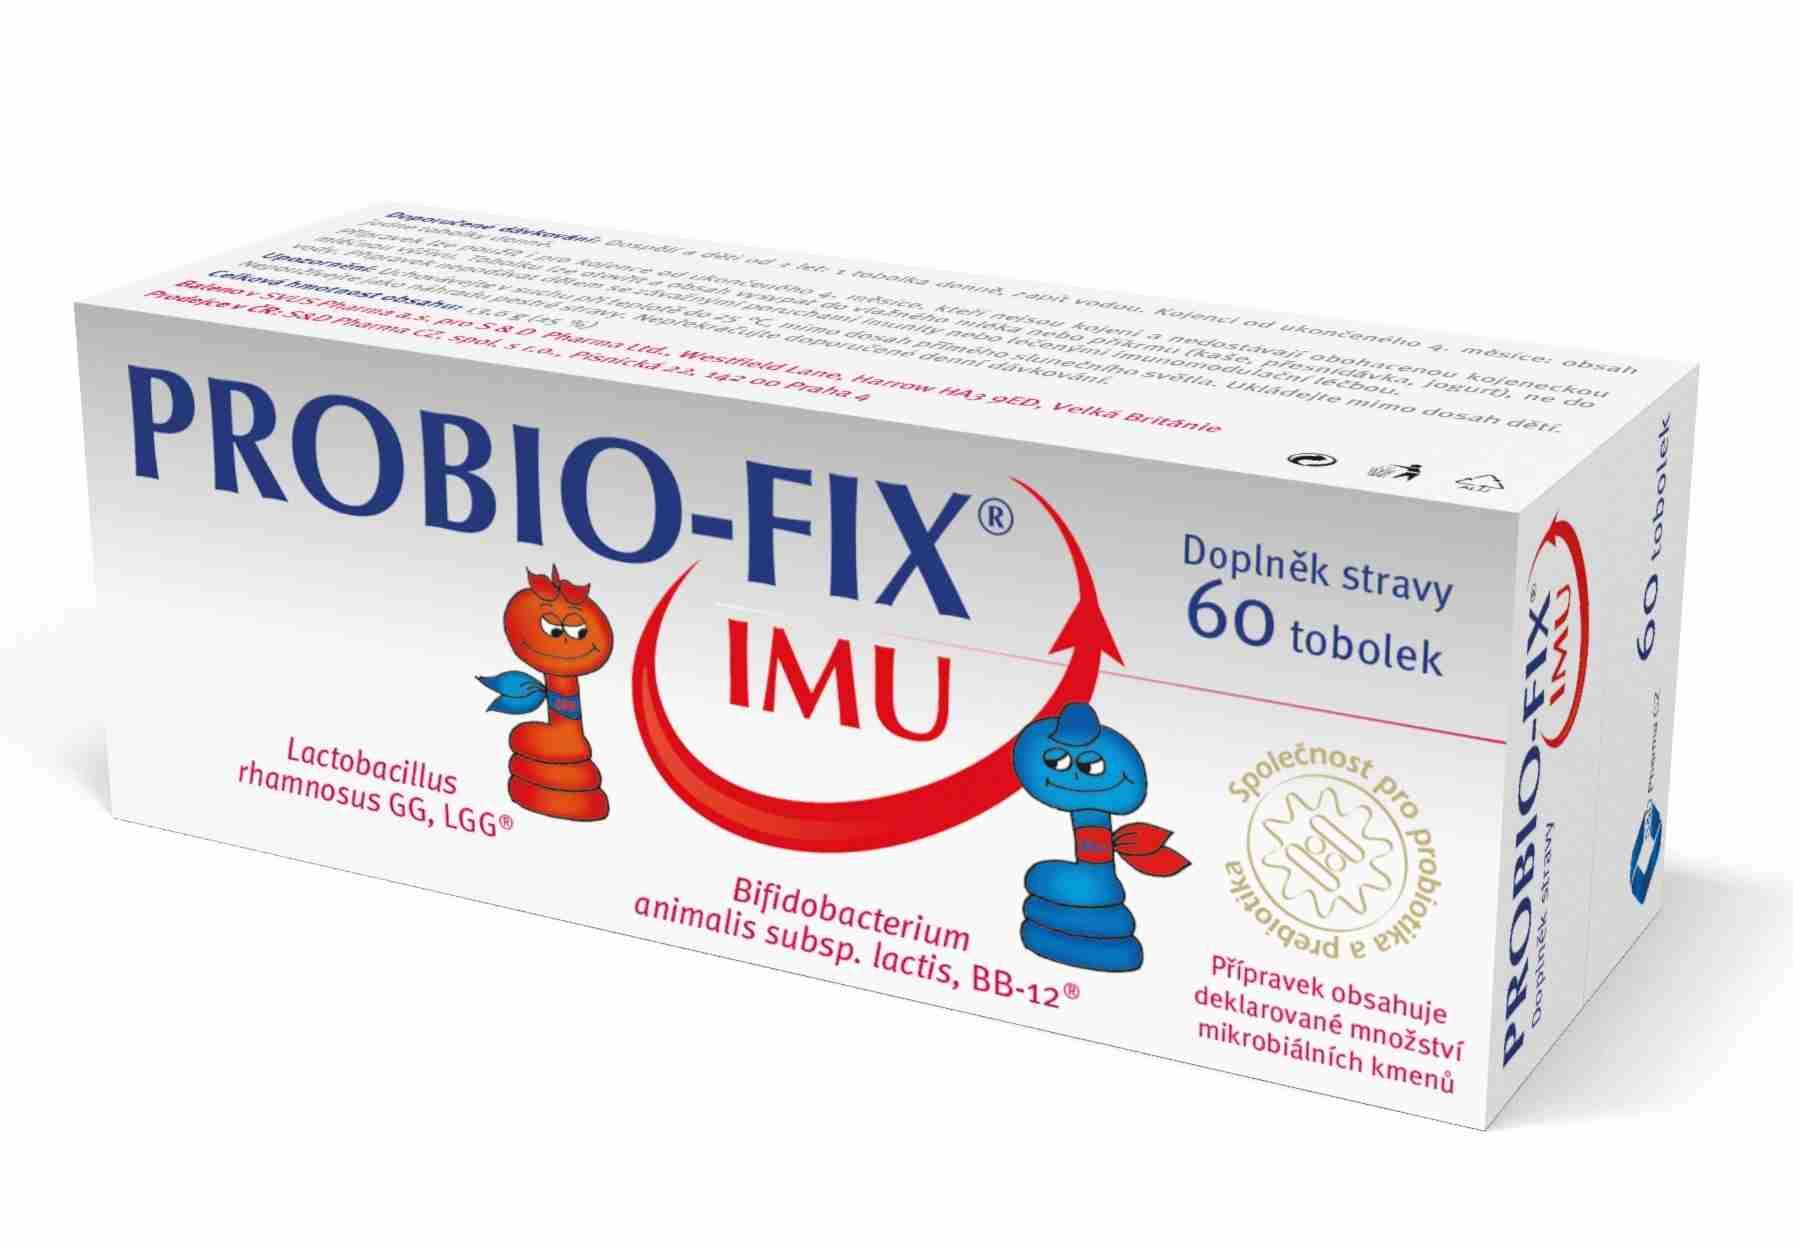 Svus Pharma a.s., Hradec Králové Probio-Fix IMU 60 tob.